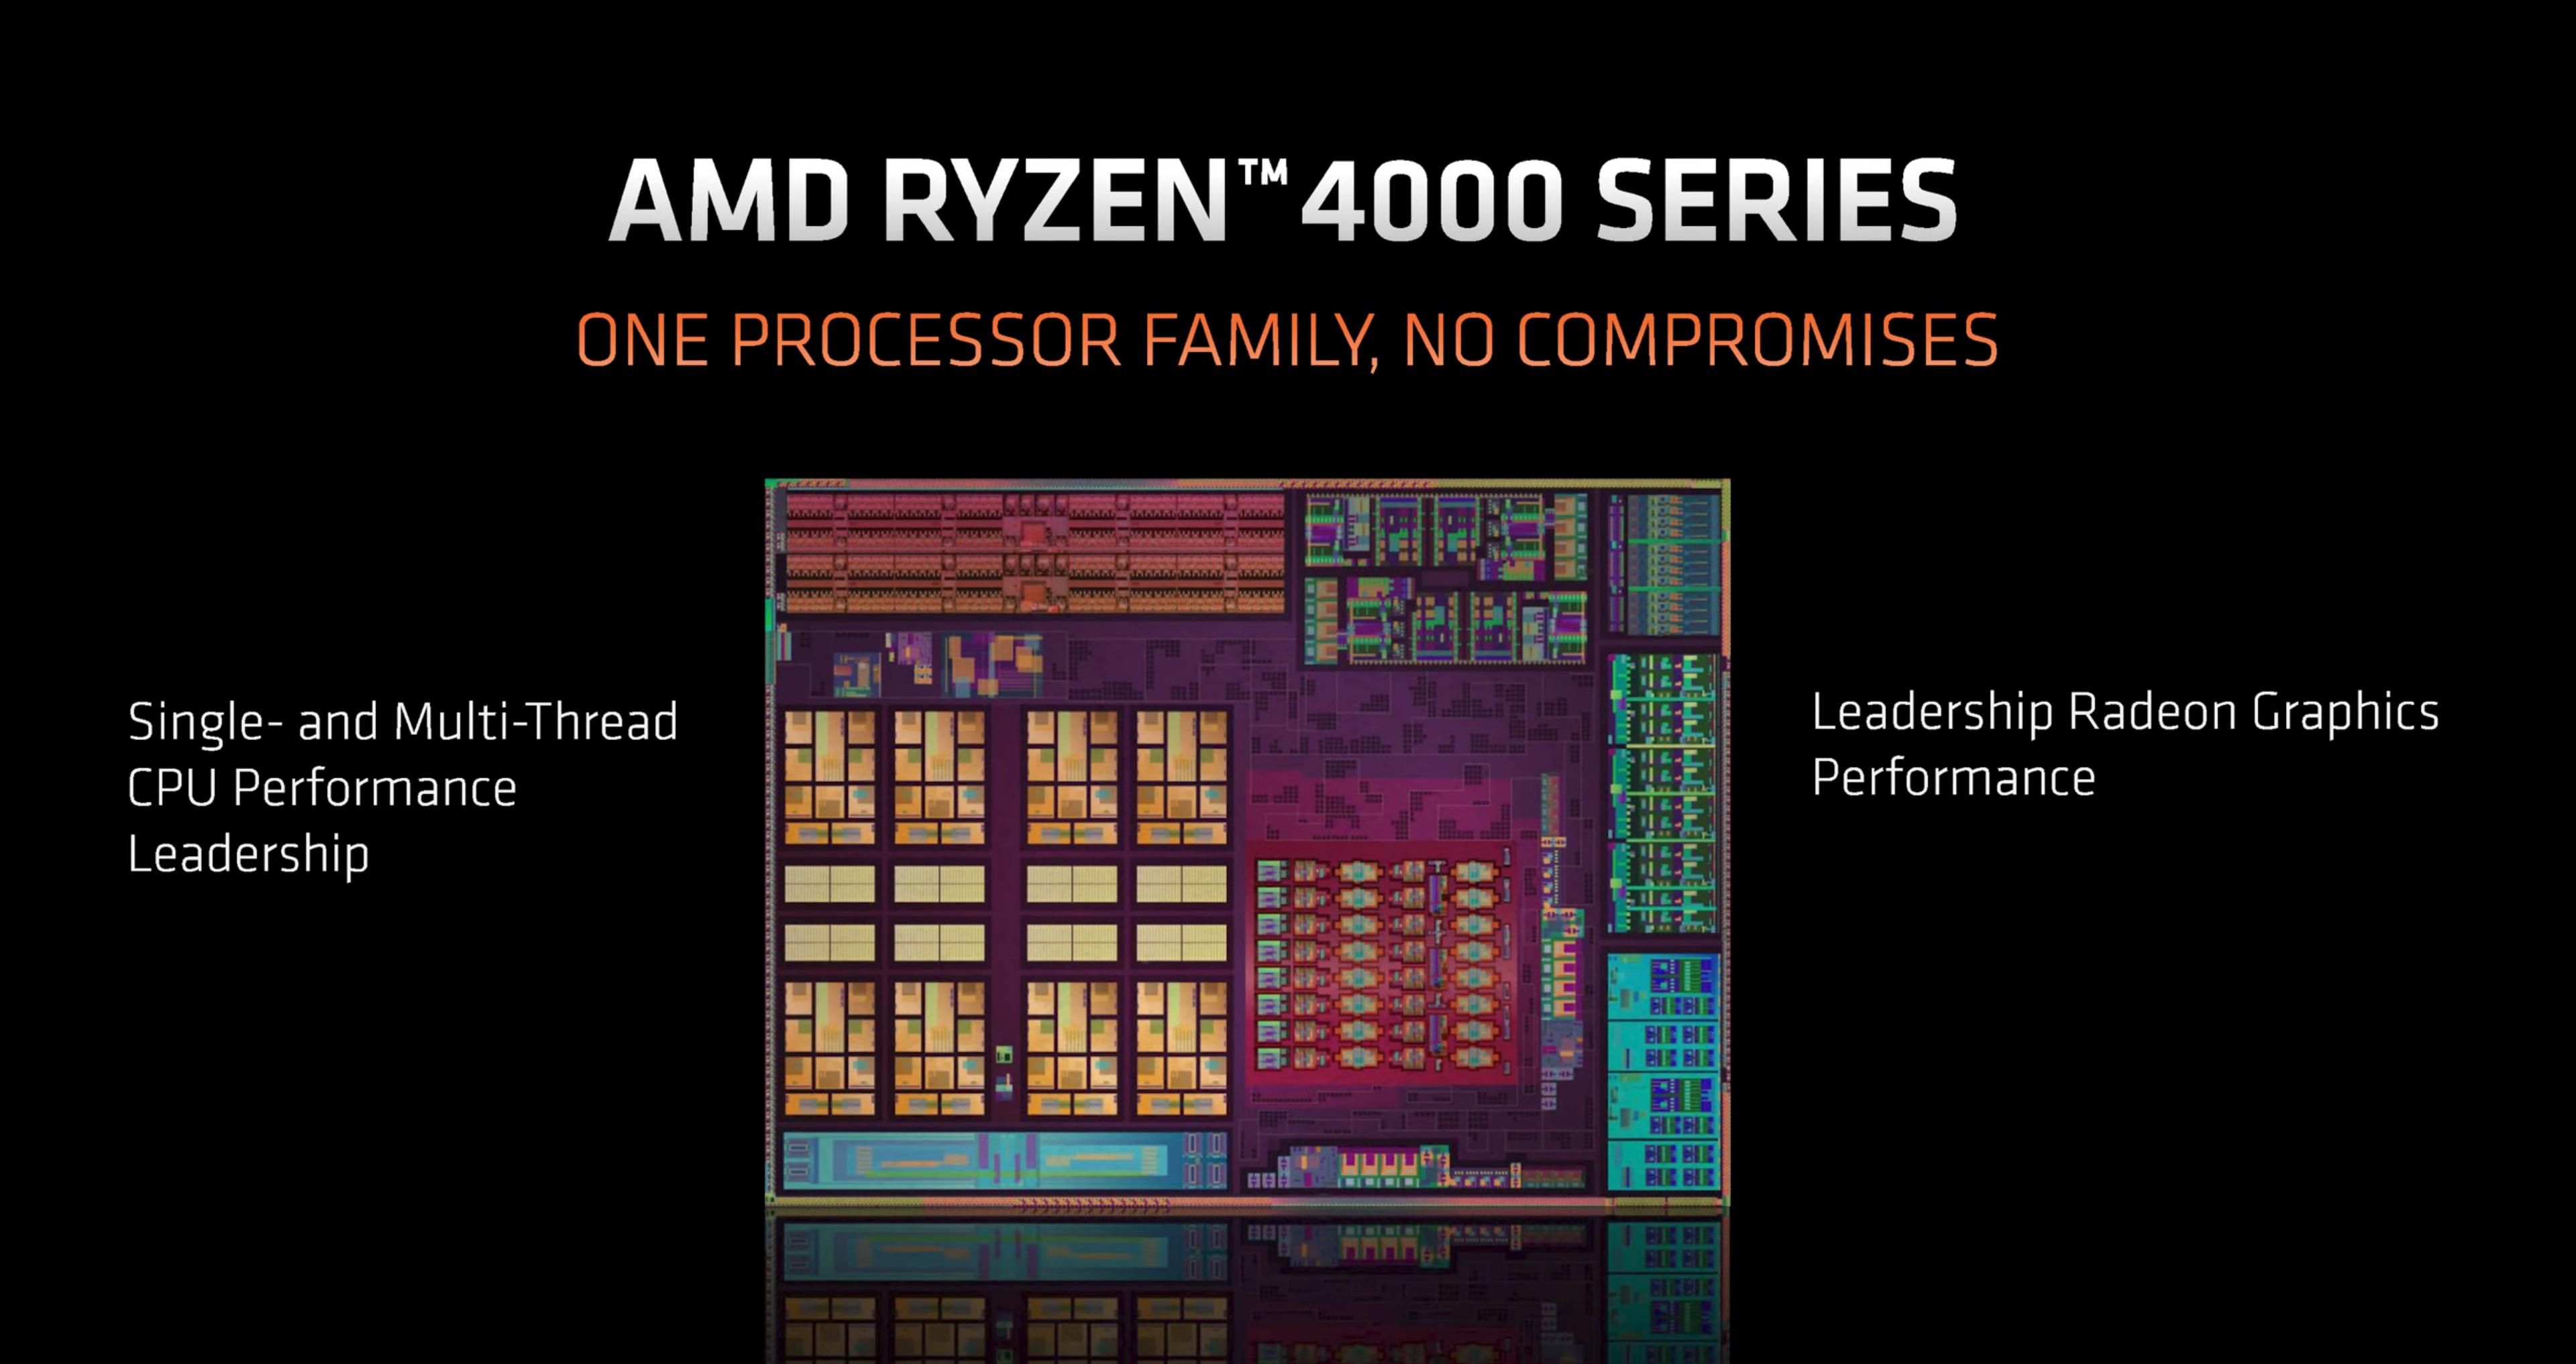 Amd Ryzen 4000 Renoir Desktop Apus Launching On 21st July Full Lineup Detailed